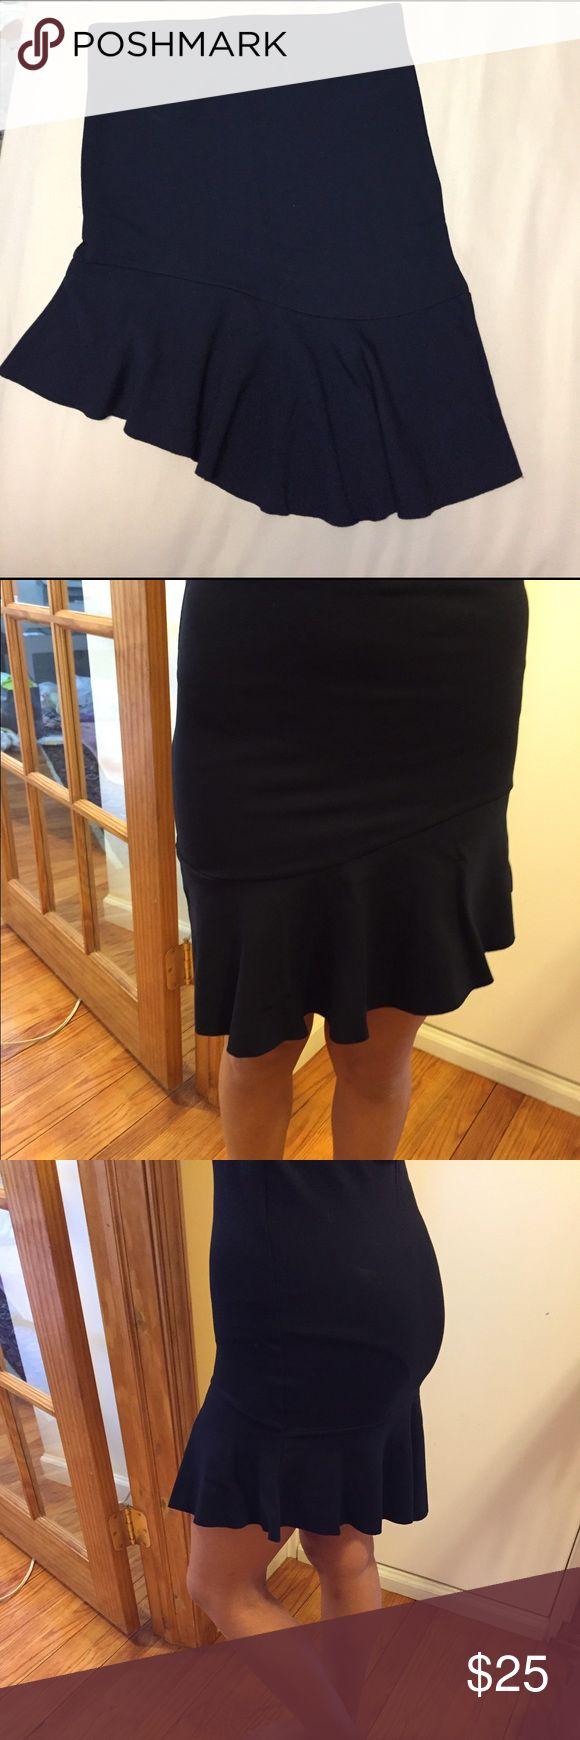 Zara black asymmetrical trumpet skirt. Zara black asymmetrical trumpet style skirt. Stretchy material. Excellent condition. zara collection Skirts Asymmetrical